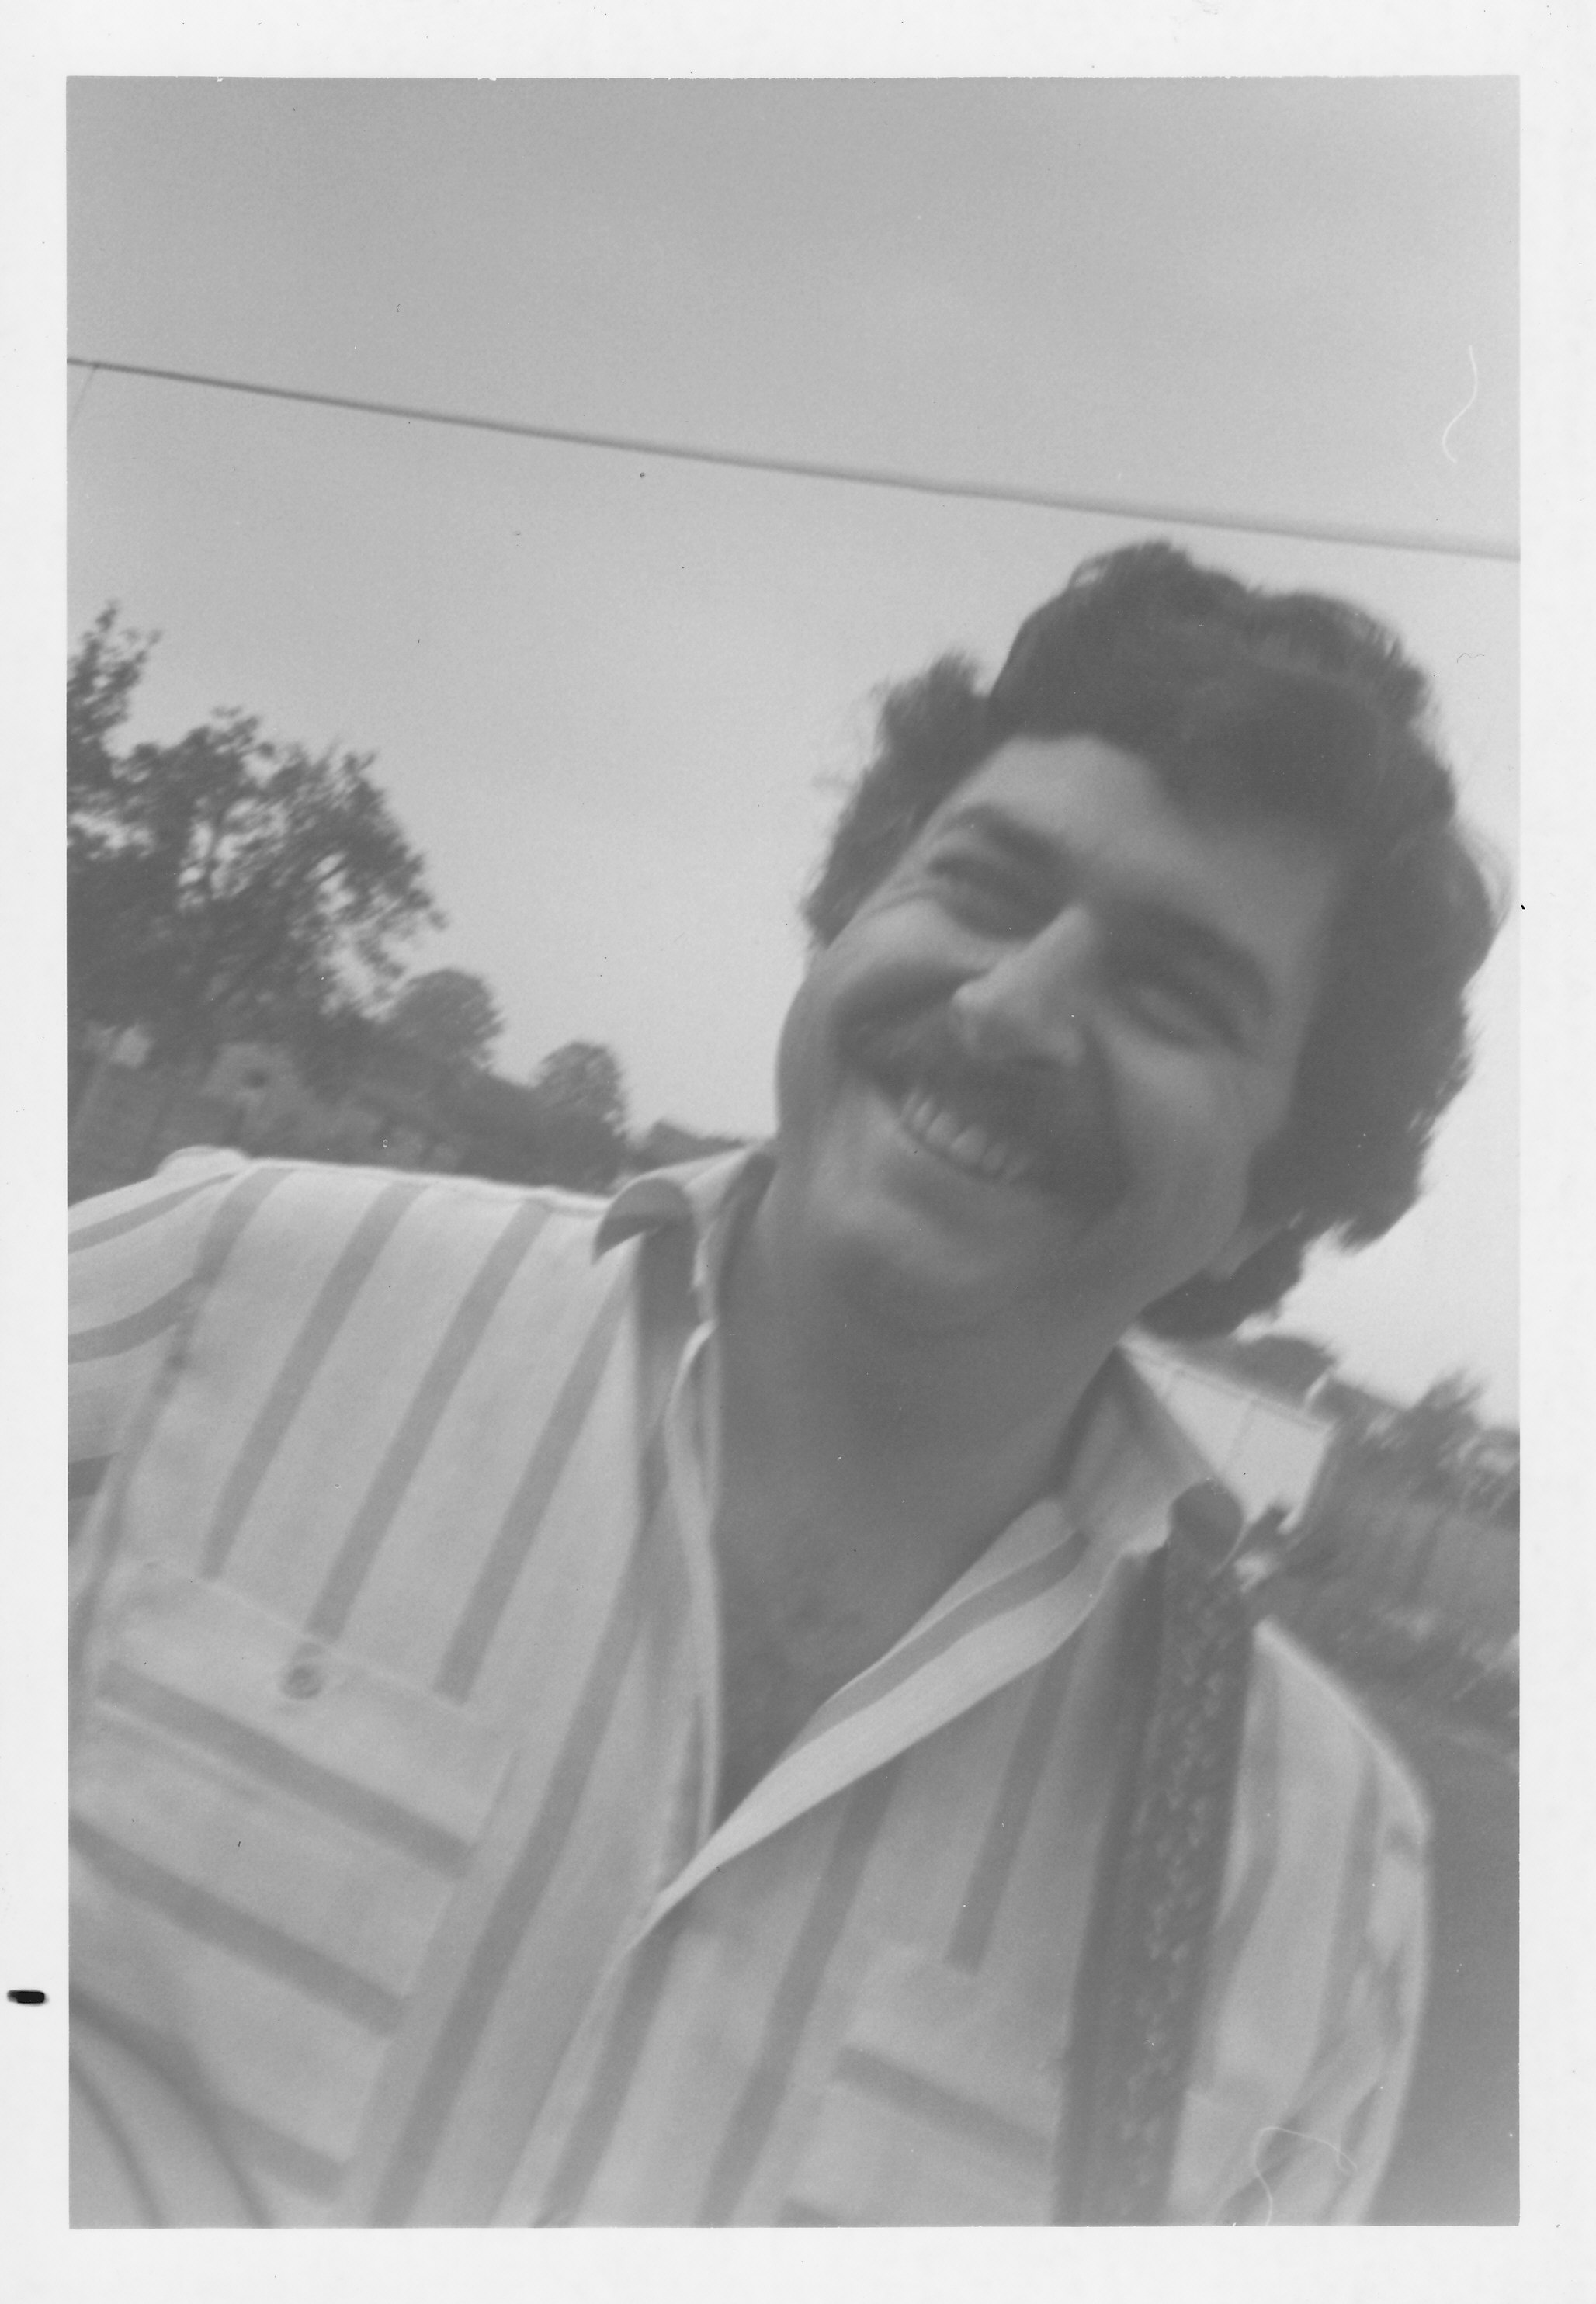 Tony Burt 1982